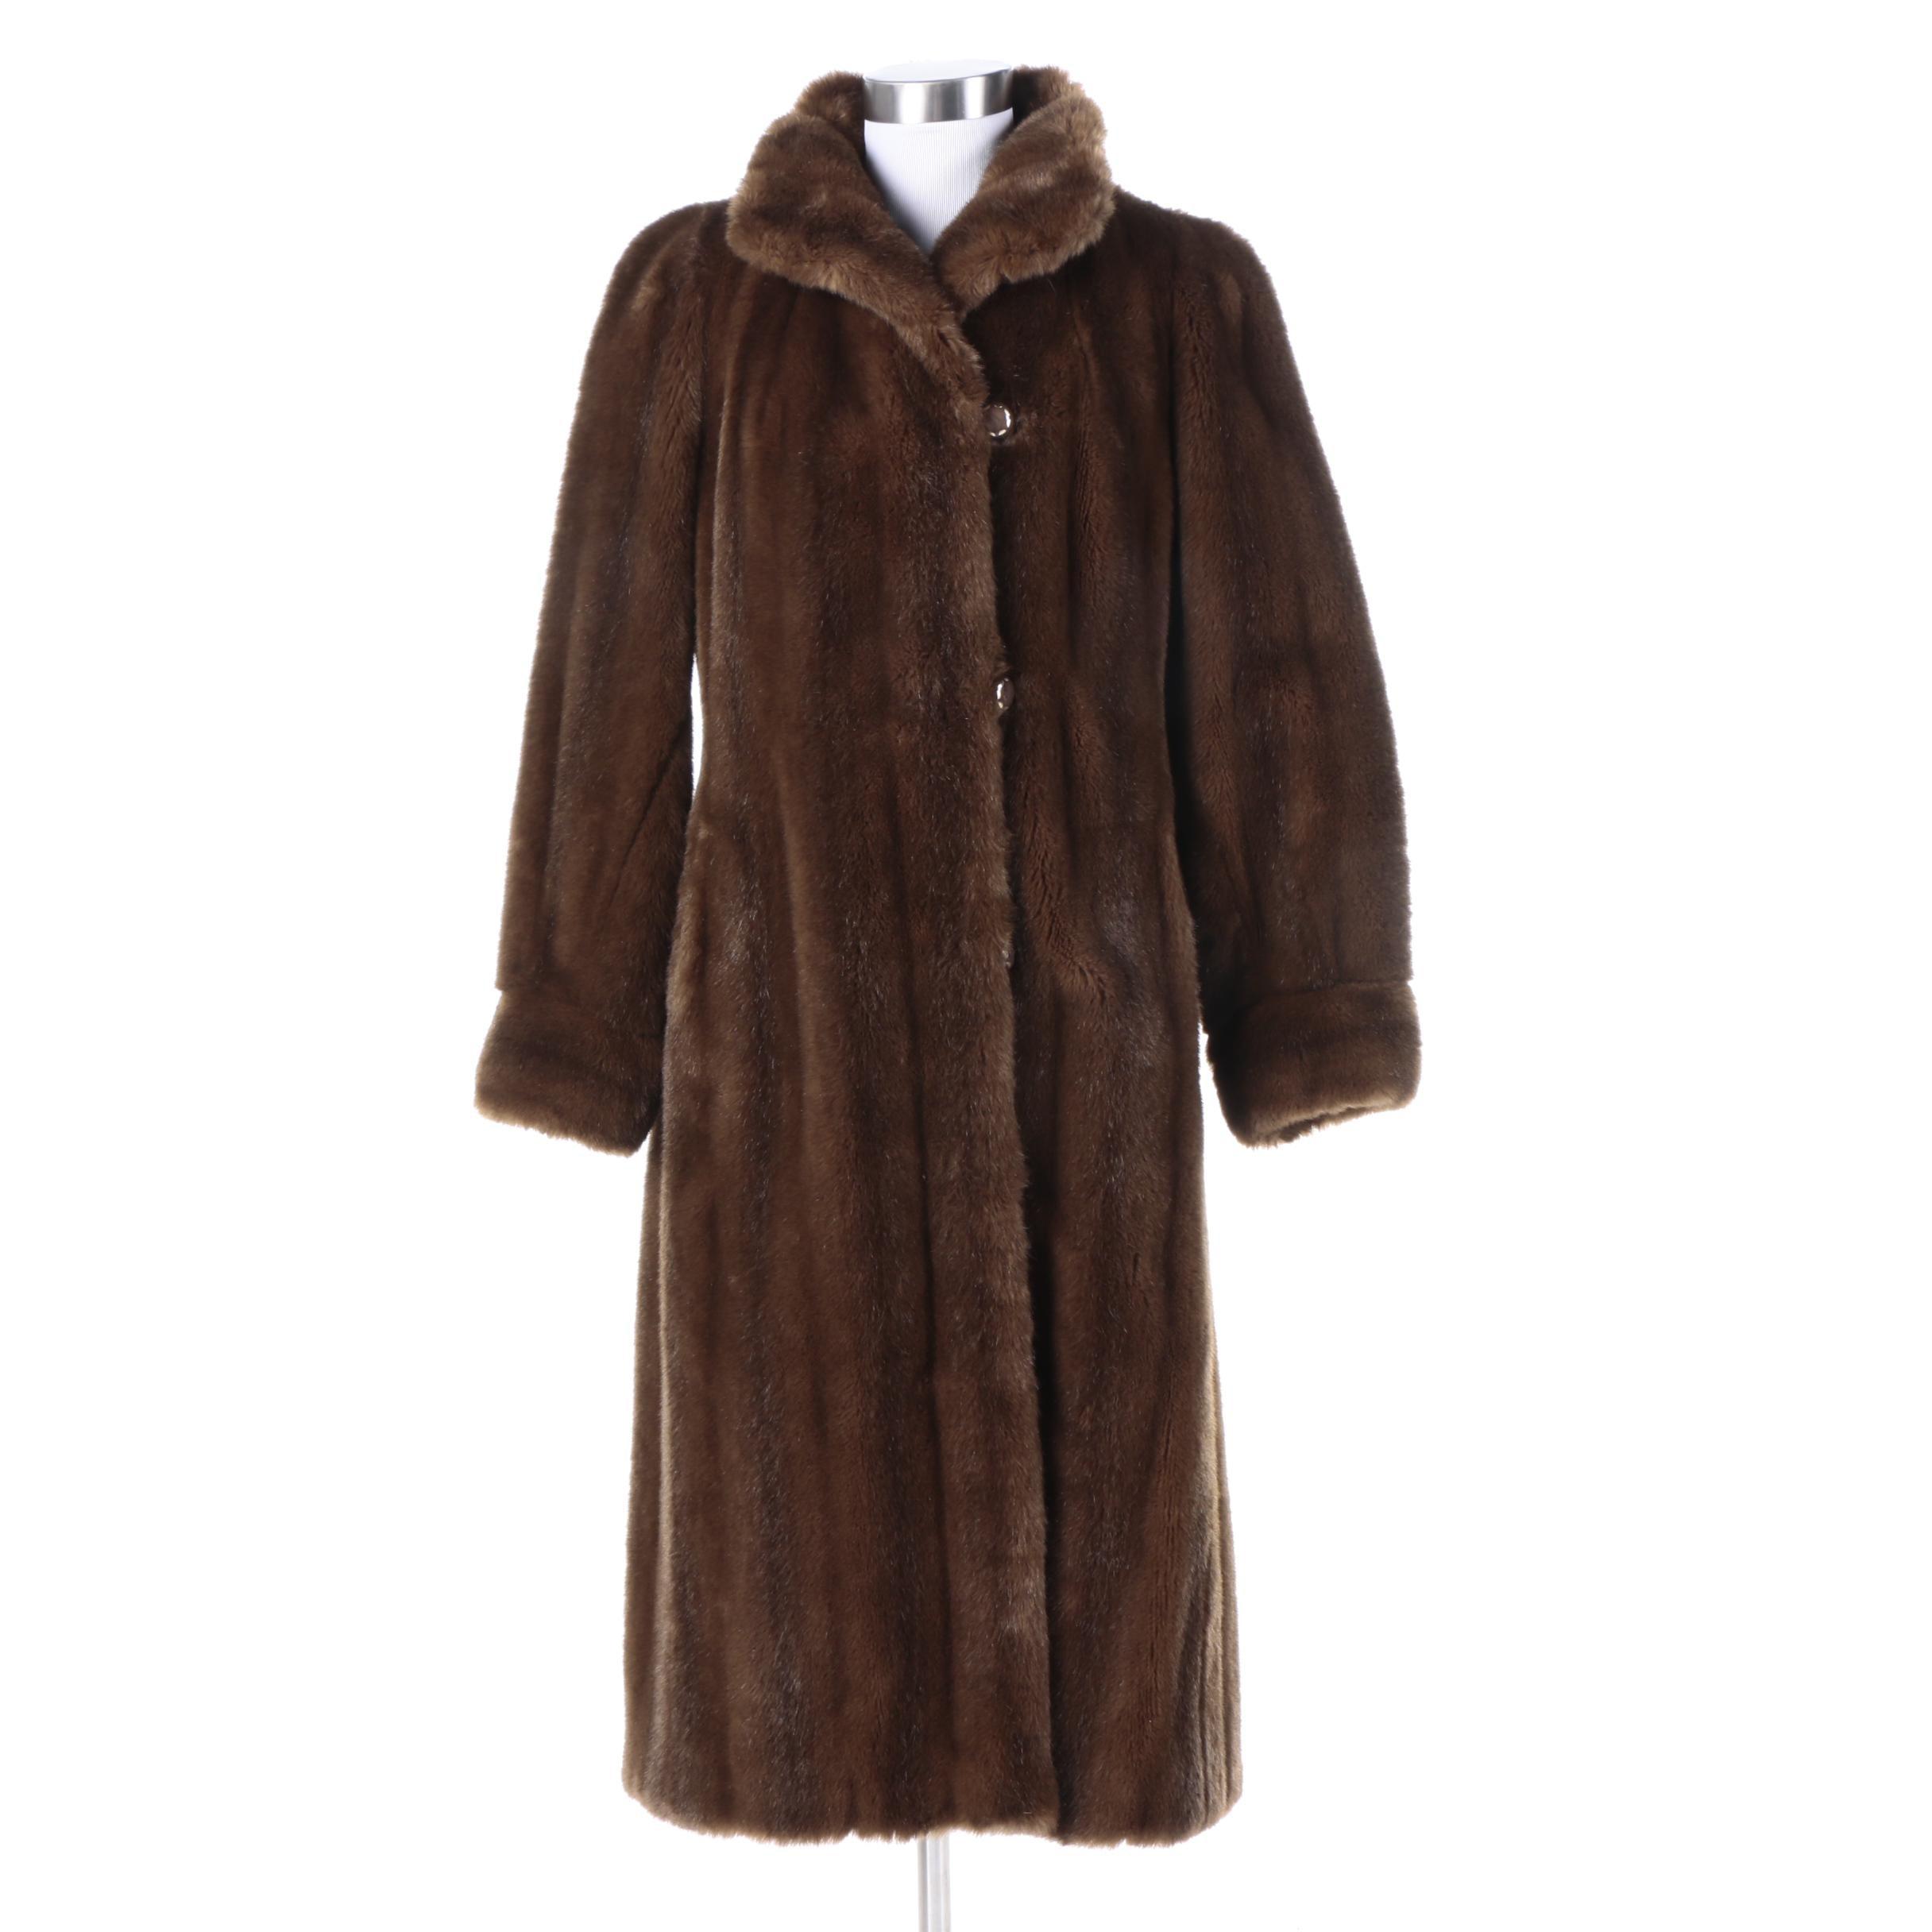 Women's Vintage Grandella Brown Faux Fur Overcoat